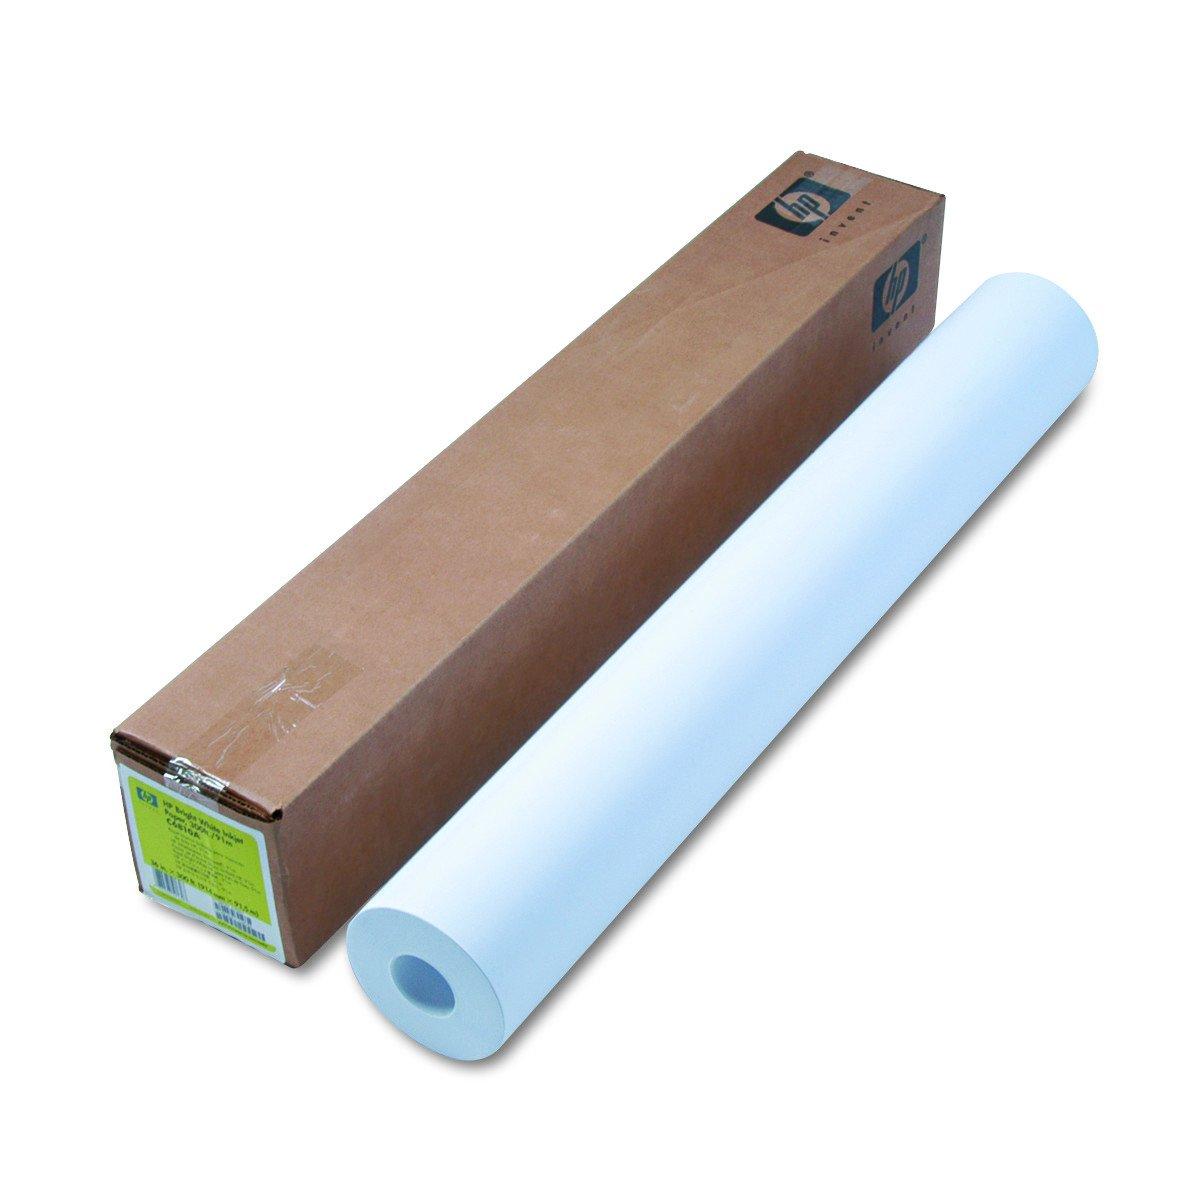 HP Bright White Inkjet Paper 4.7 mil, 24 lb, 90 g/m2, 2'' Core, 1 roll/carton (36'' x 300')